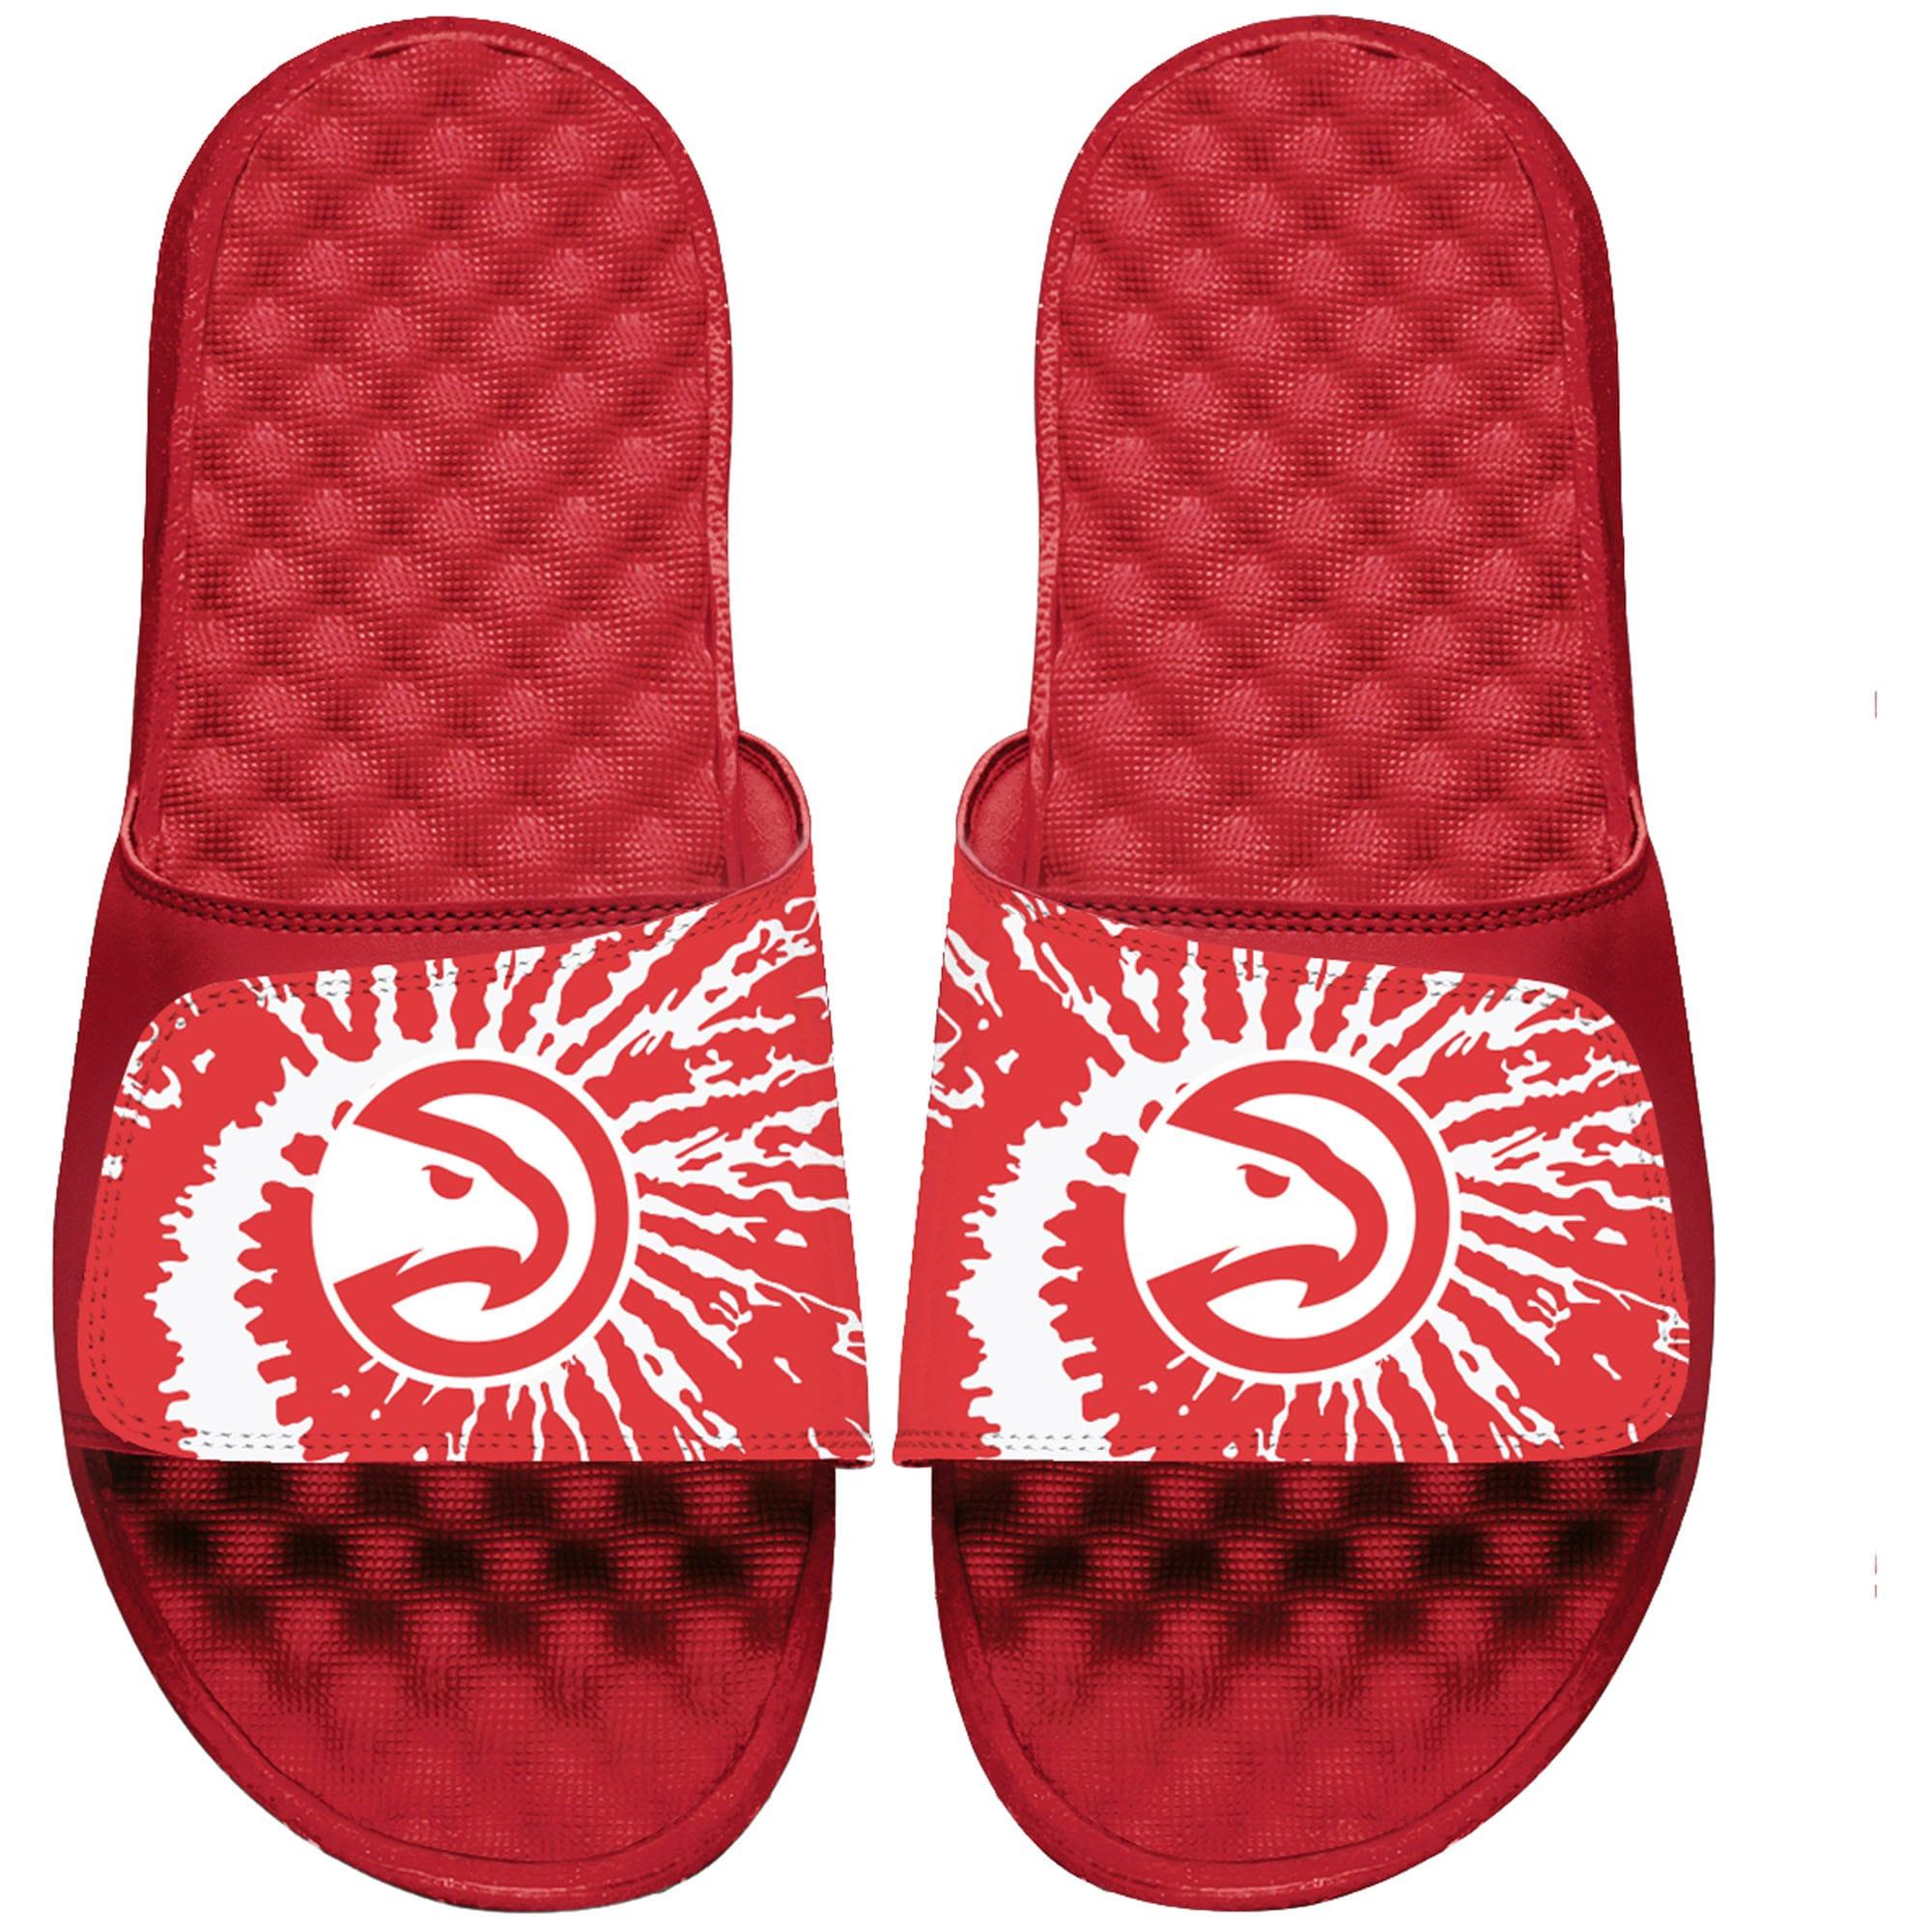 Atlanta Hawks ISlide Tie Dye Slide Sandals - Red